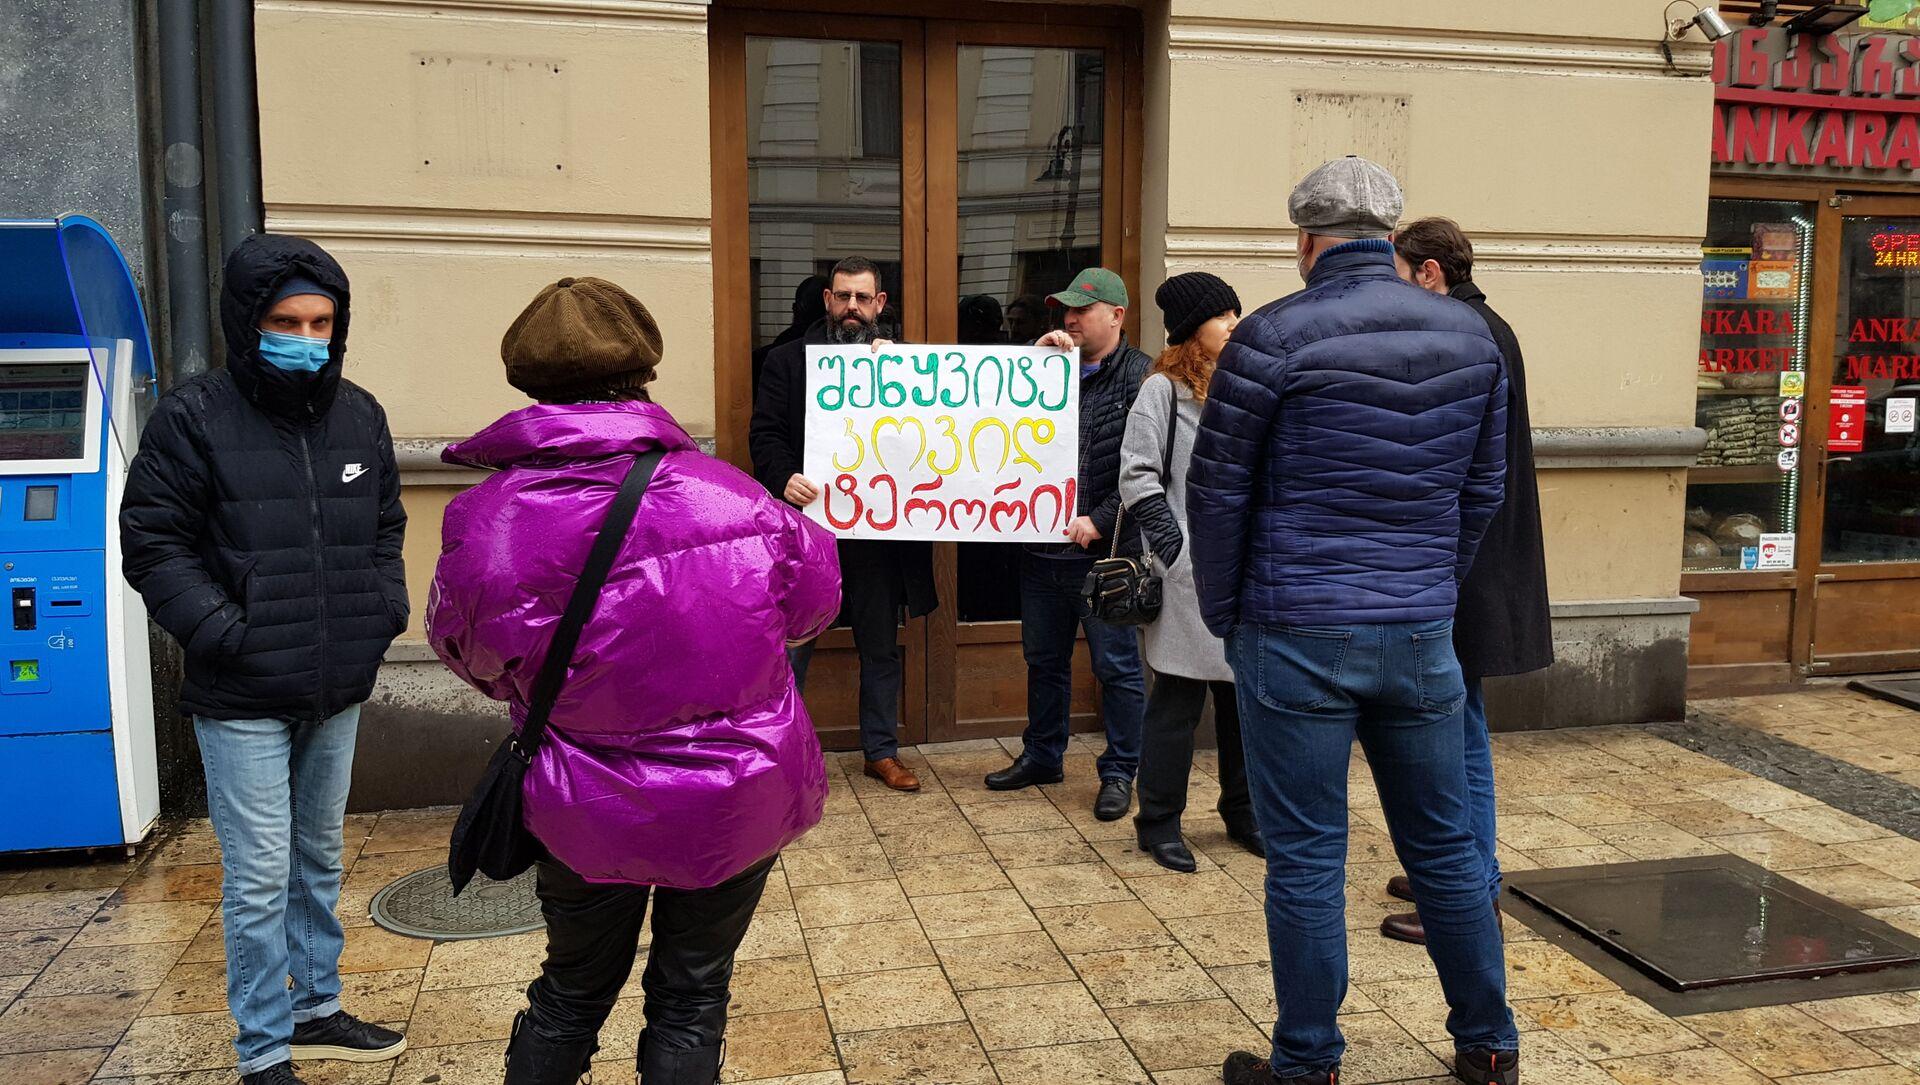 Акция протеста под лозунгом Прекратите ковид-террор на проспекте Агмашенебели  16 февраля 2021 года - Sputnik Грузия, 1920, 16.02.2021